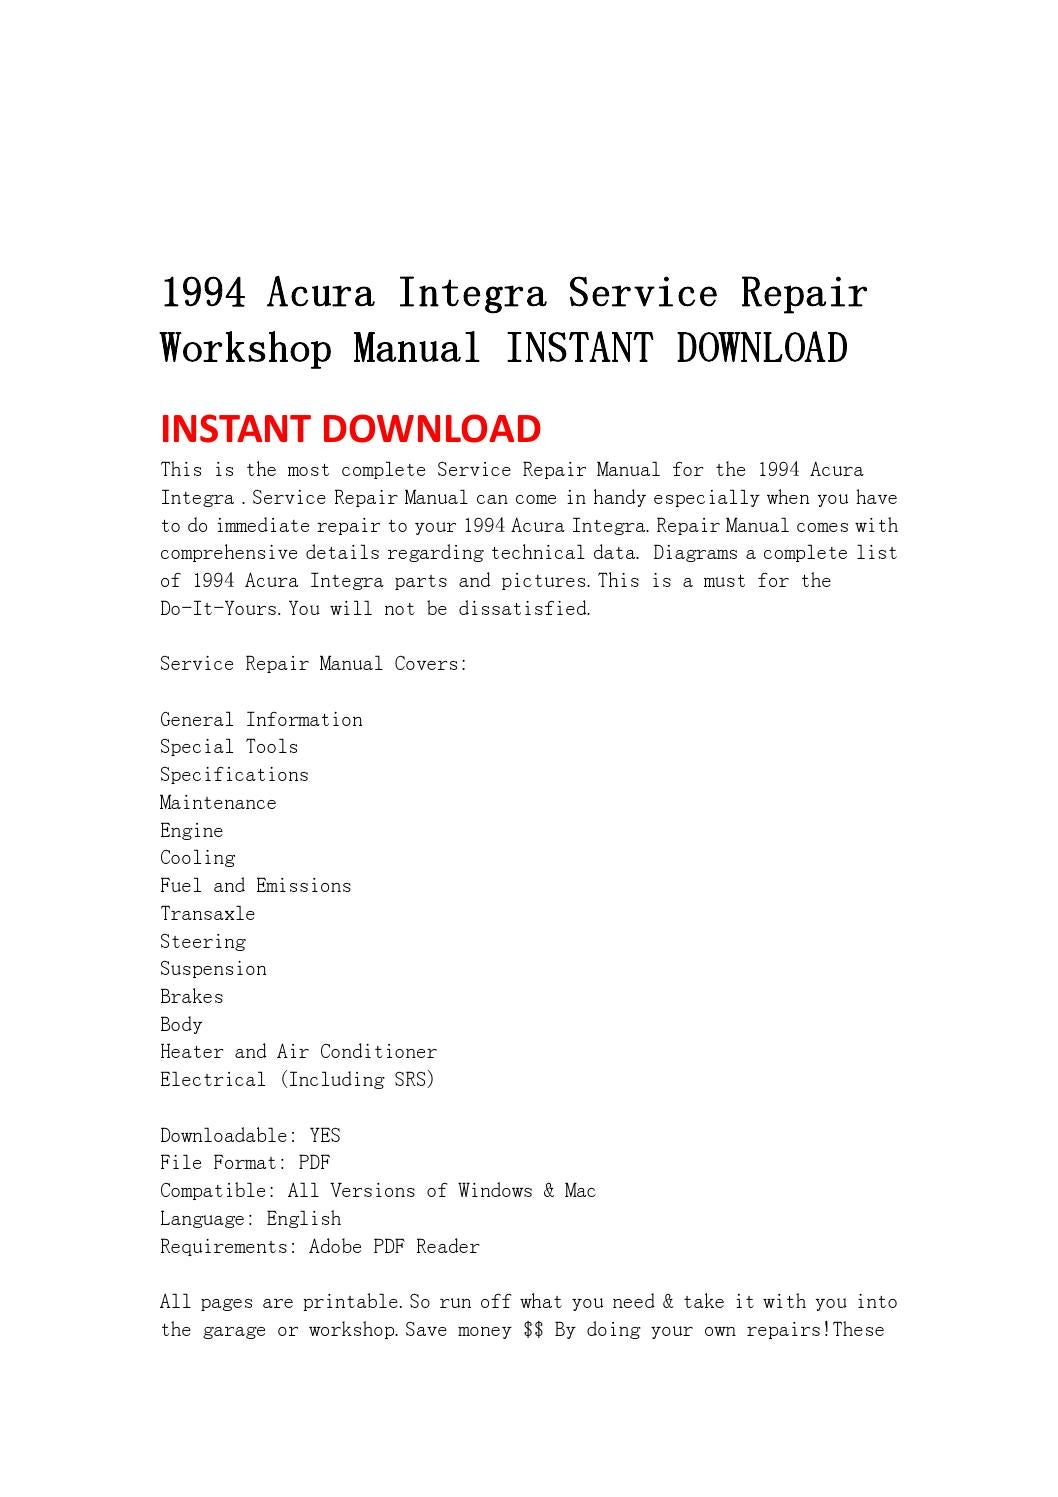 Acura Integra Owners Manual